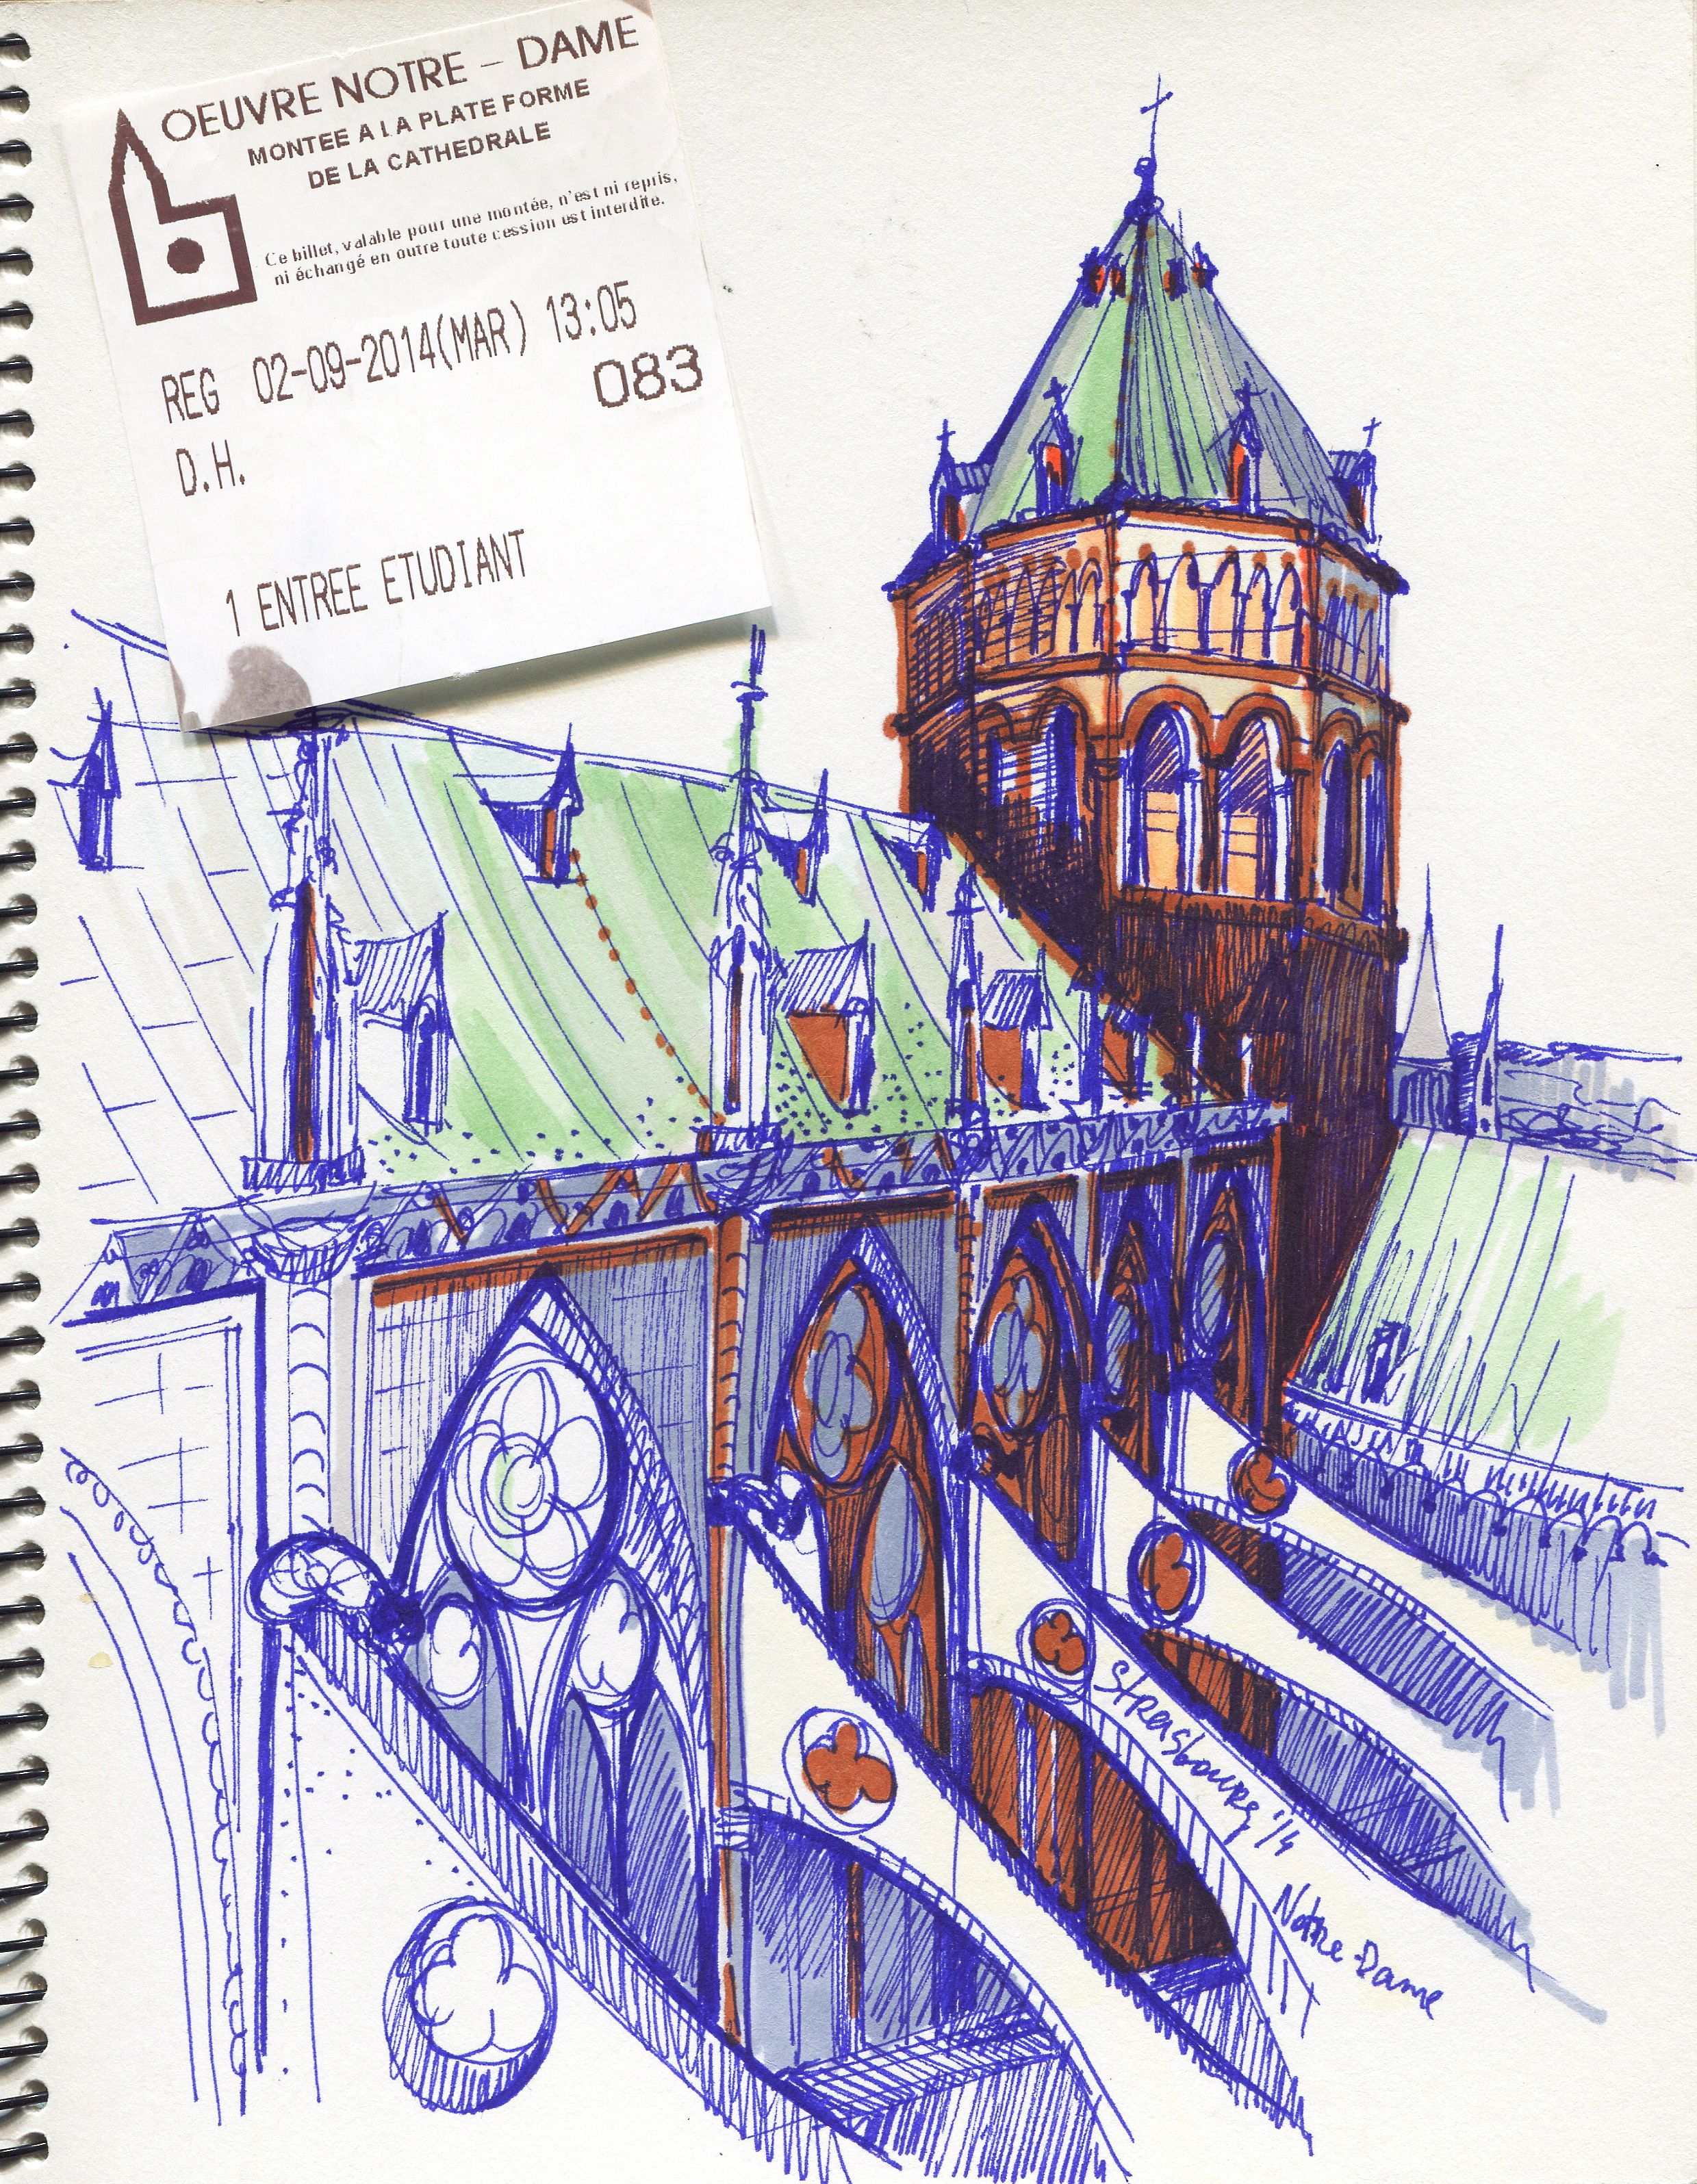 Sketch in Strasbourg, France. 2014 #sketchbook, #copicmarkers, #promarkers #illustration #sketch #sketchbook #graphic #promarker #copicmarker #france #strasbourg  #notredame by Olga Uva